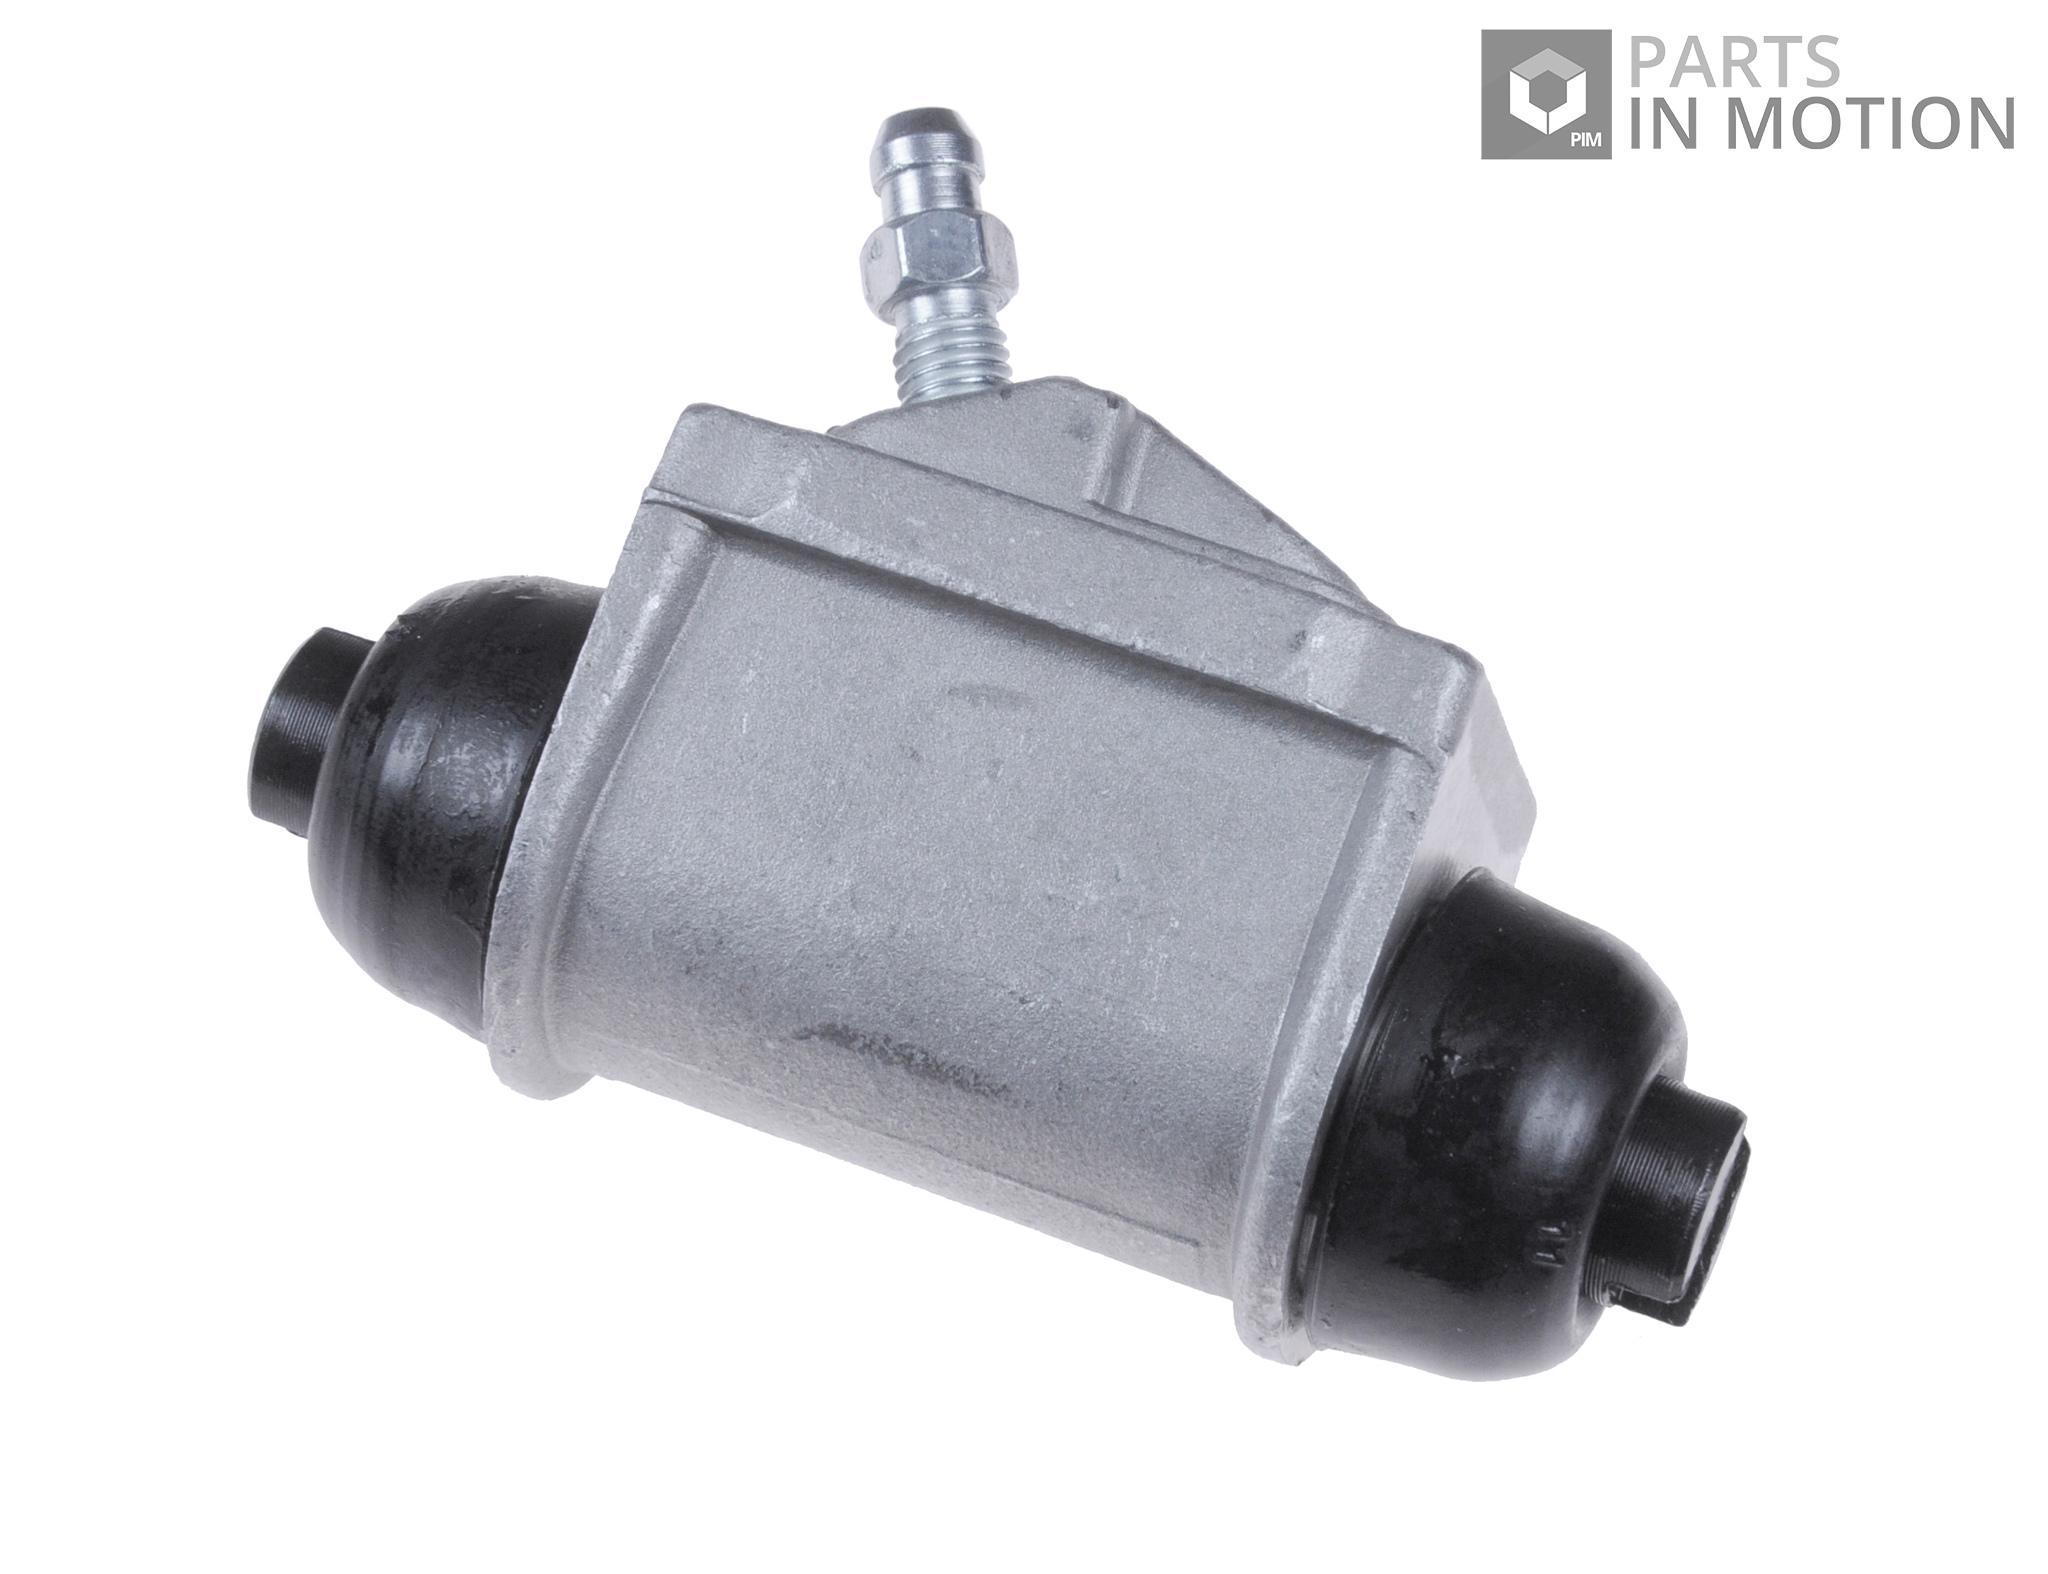 Rear Wheel Cylinder fits 86-95 Suzuki Samurai NAPA P9384 5340283300